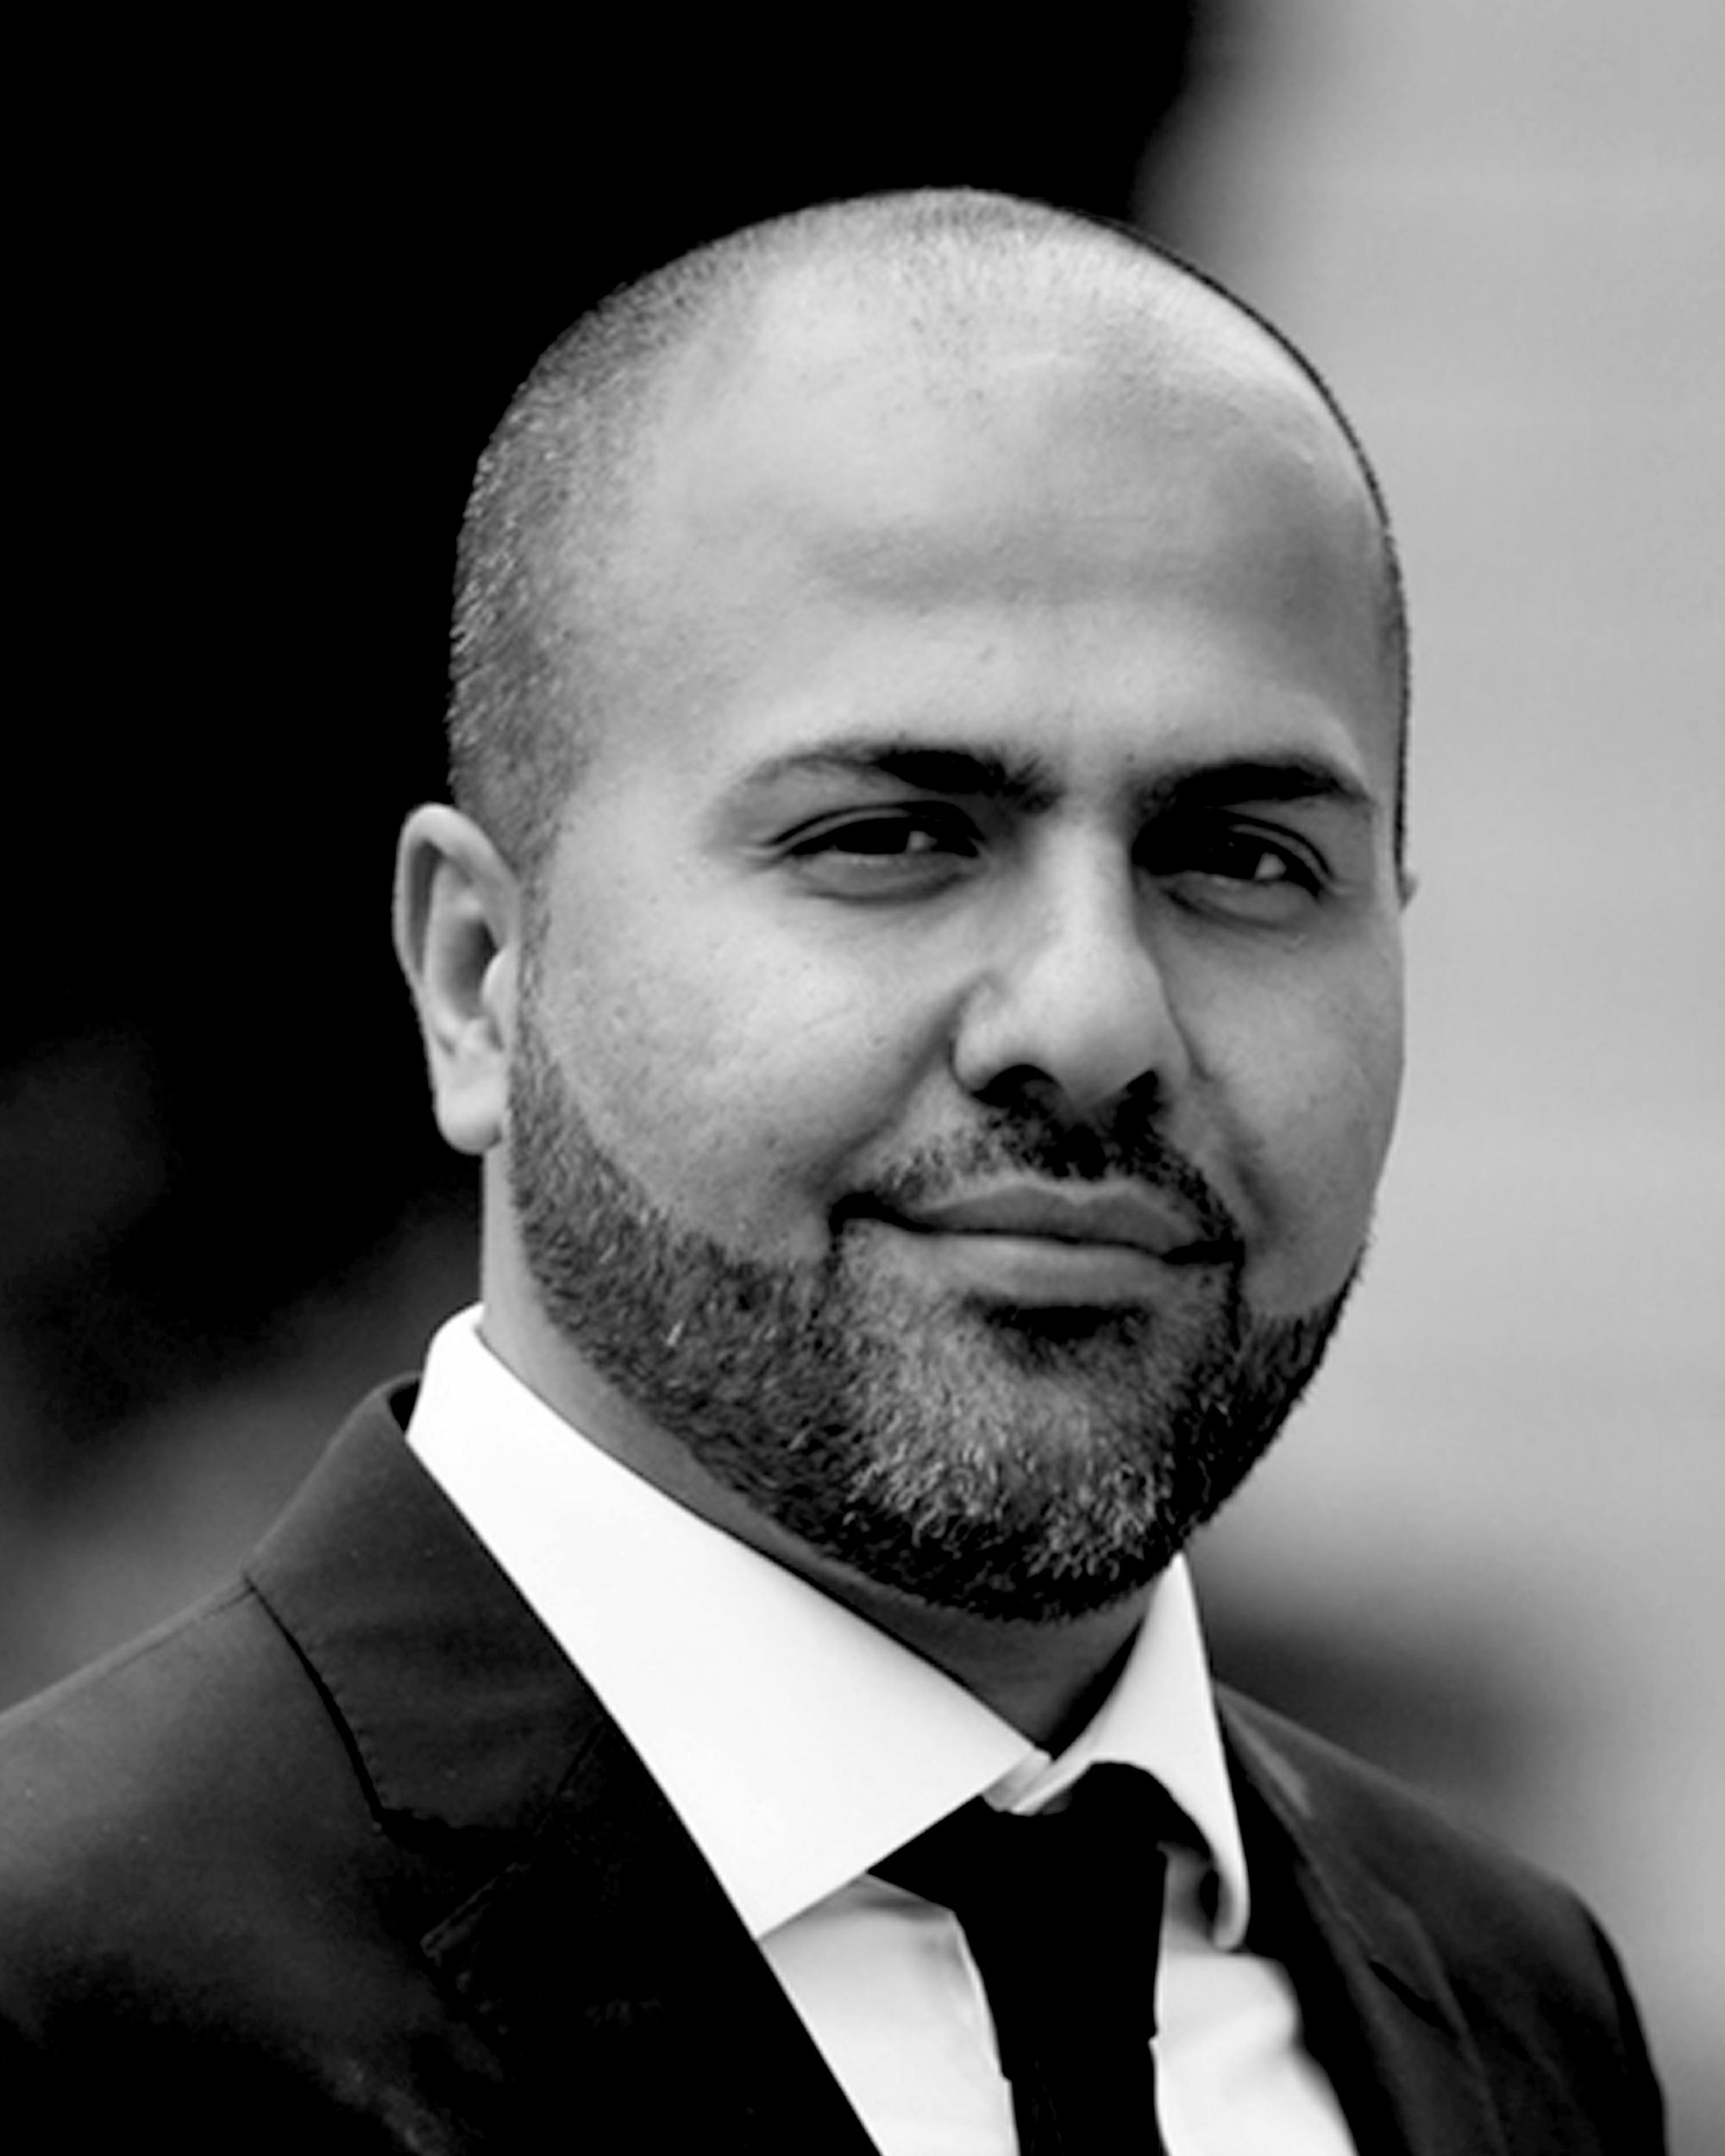 Headshot of Hassan Ktaech